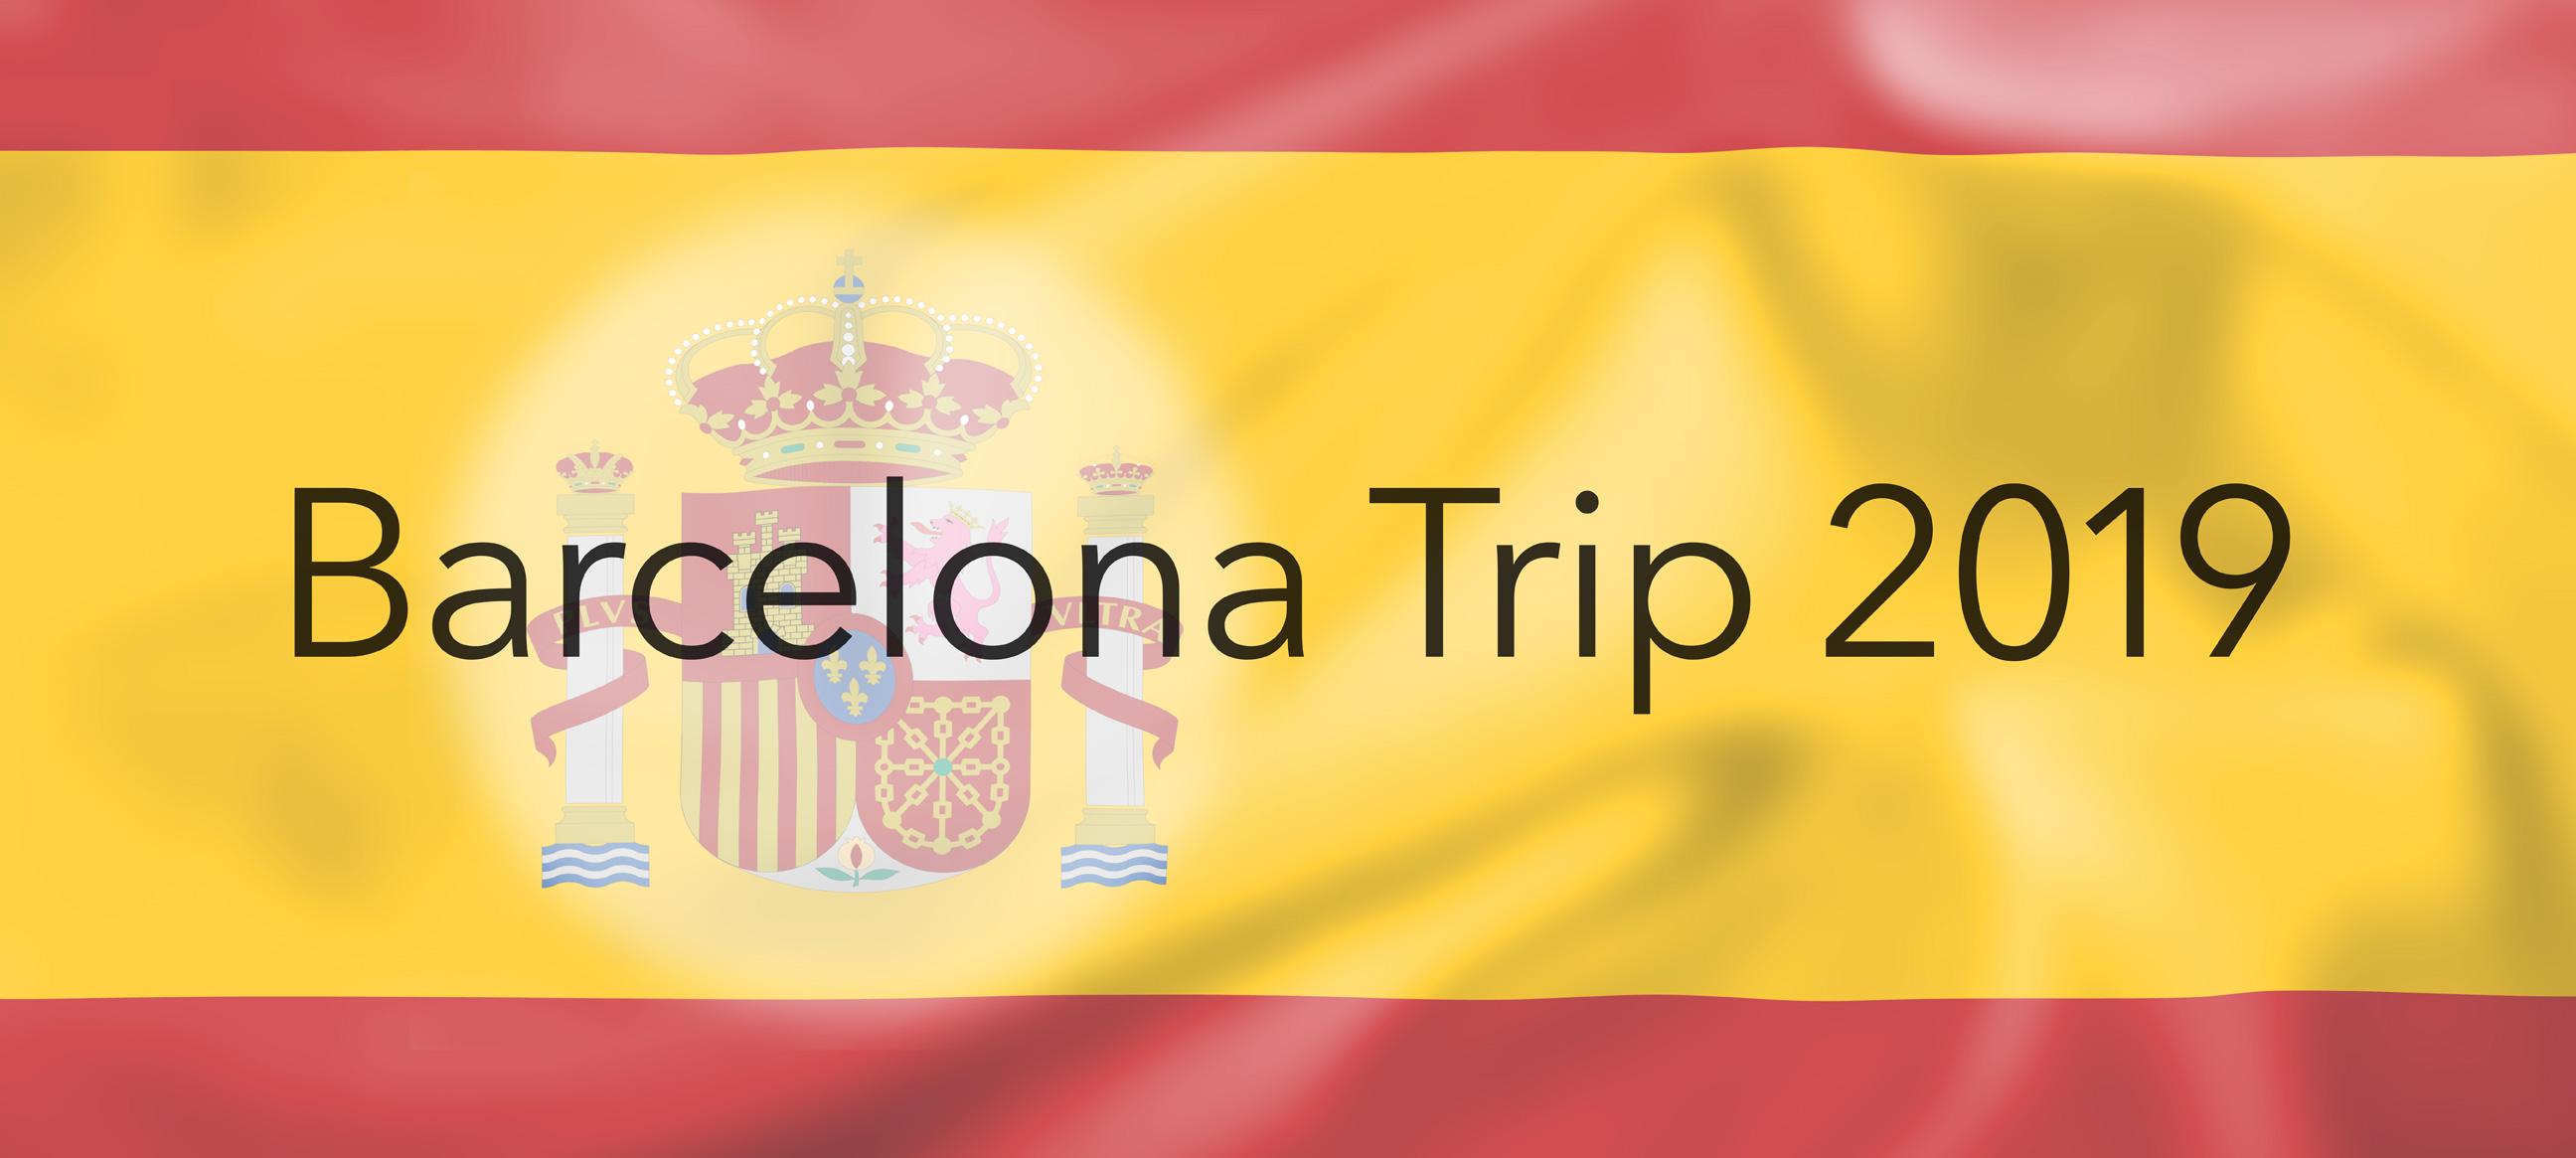 Barcelona 2019 – Important Passport Information